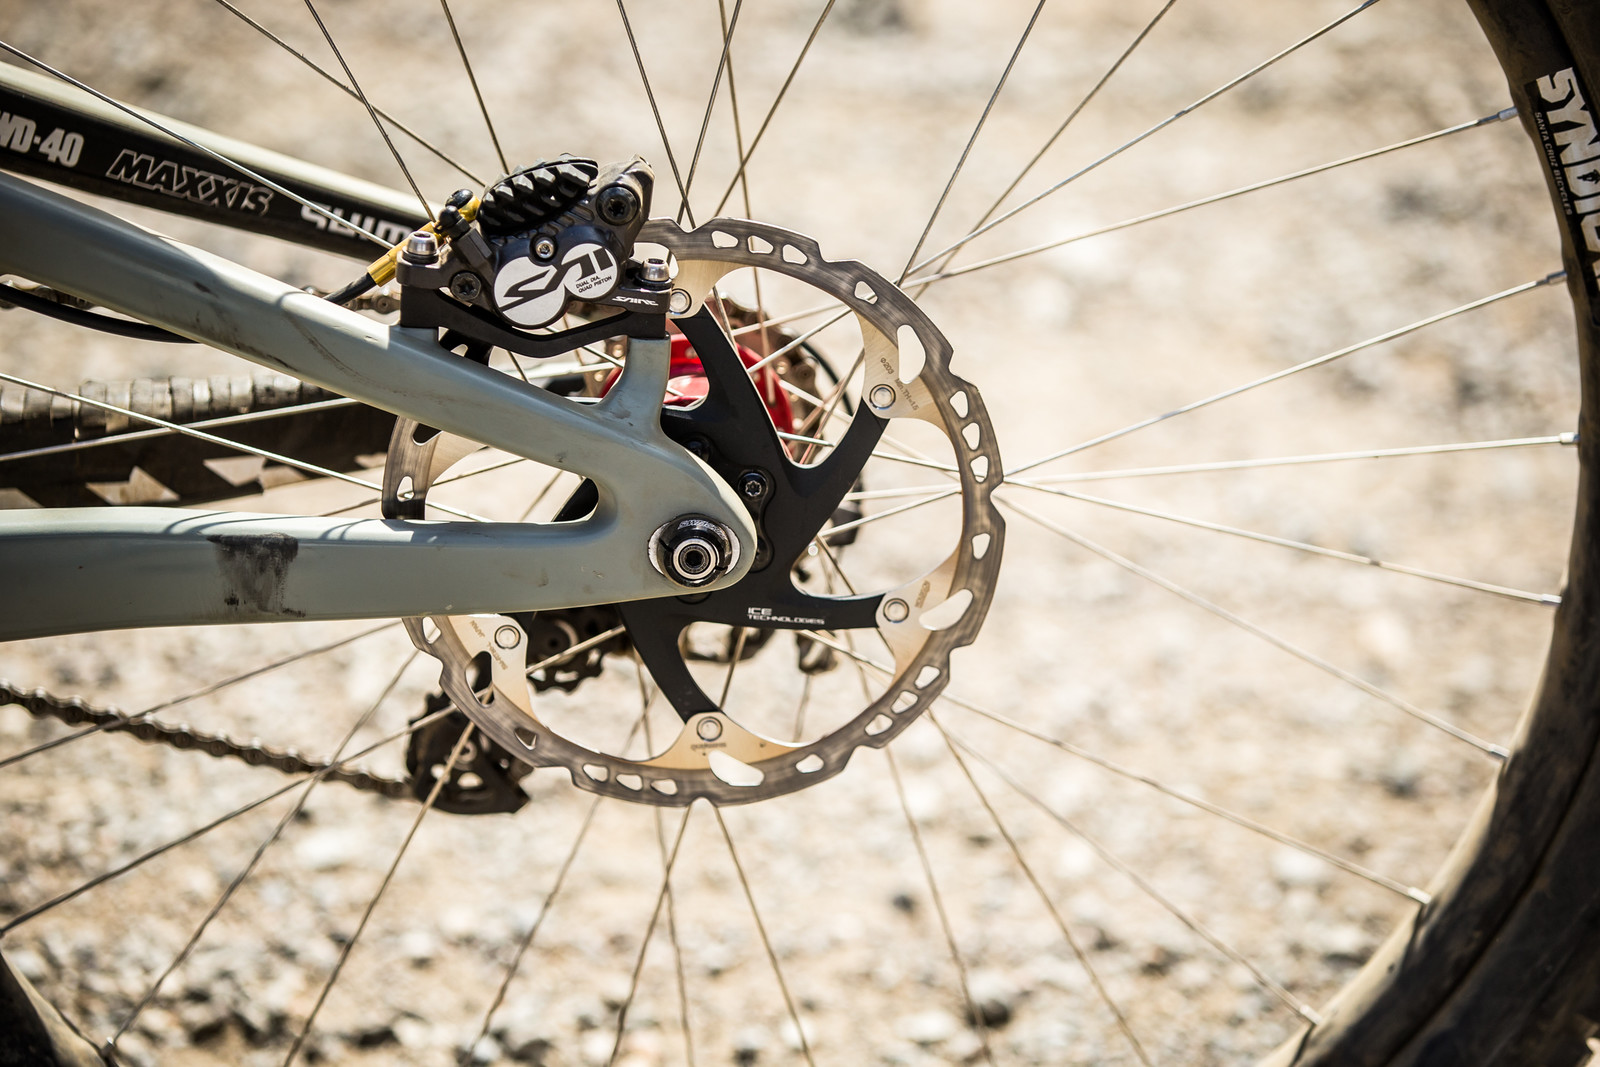 Shimano Saint Brakes and Subtle Chainstay Length Options - WINNING BIKE - Loris Vergier's Santa Cruz V10cc 29 - Mountain Biking Pictures - Vital MTB